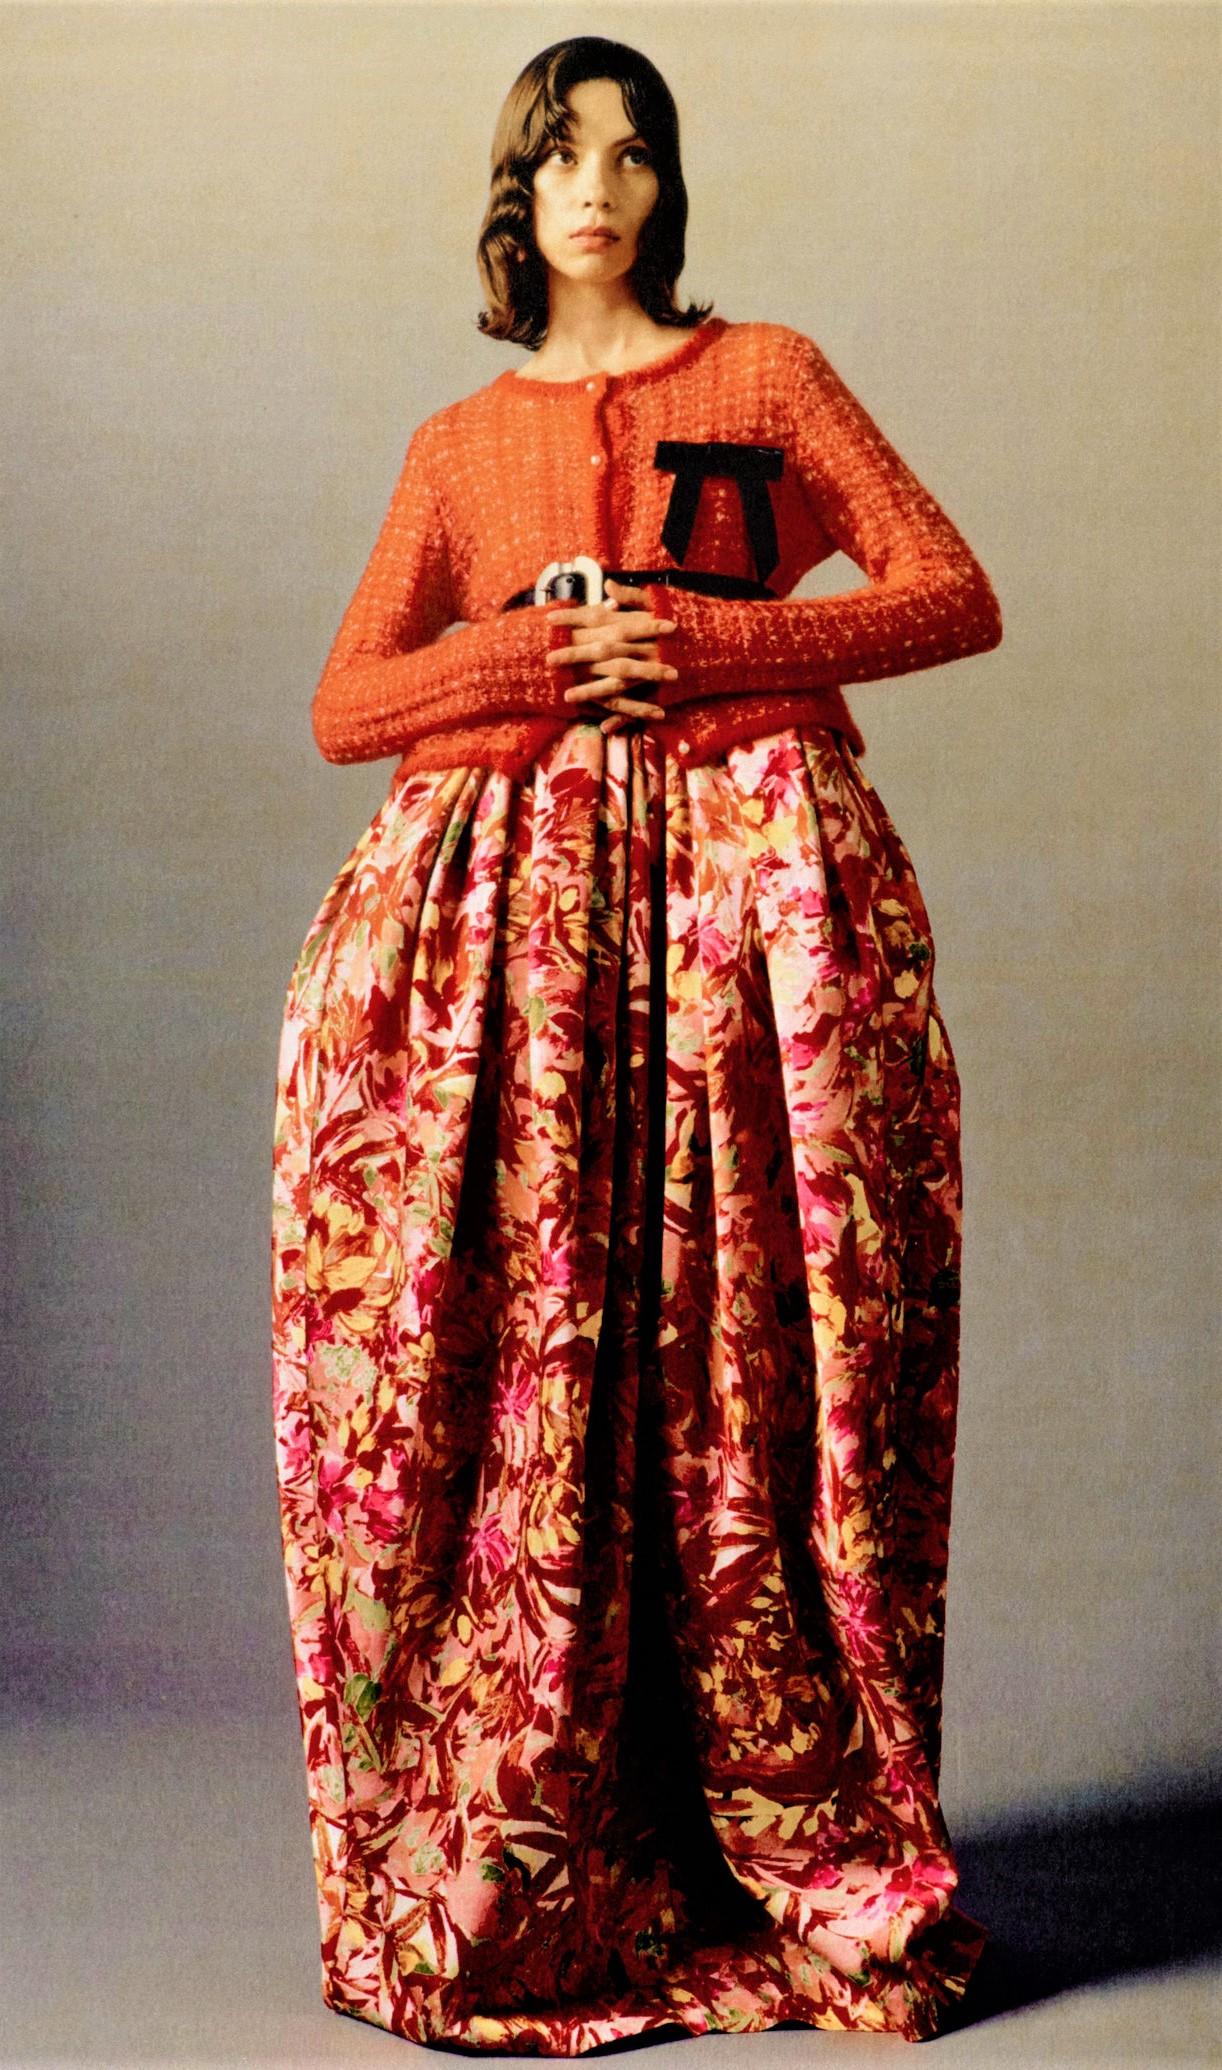 Ming Ma long skirt vogue shanghai cropped use.jpg